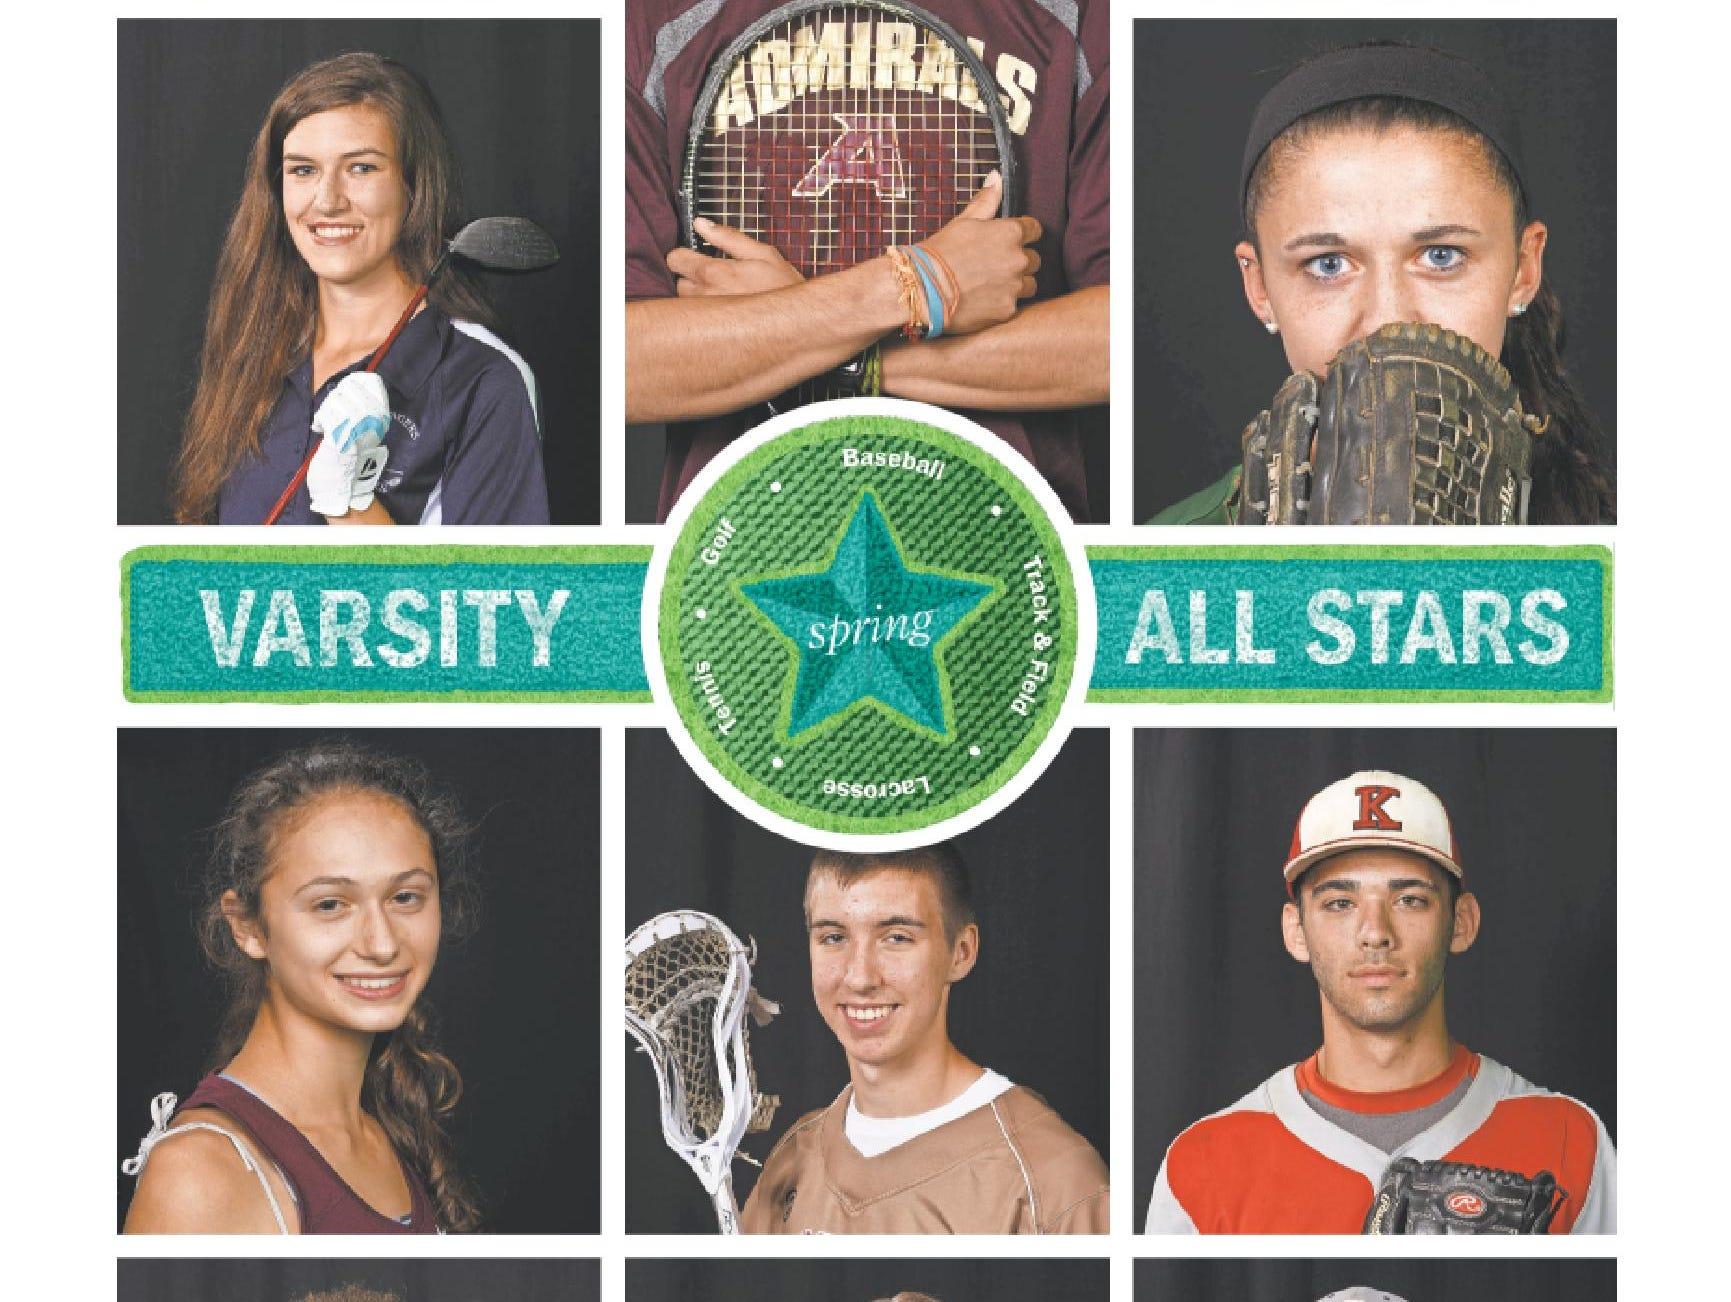 Poughkeepsie Journal 2015 Spring High School All Stars cover